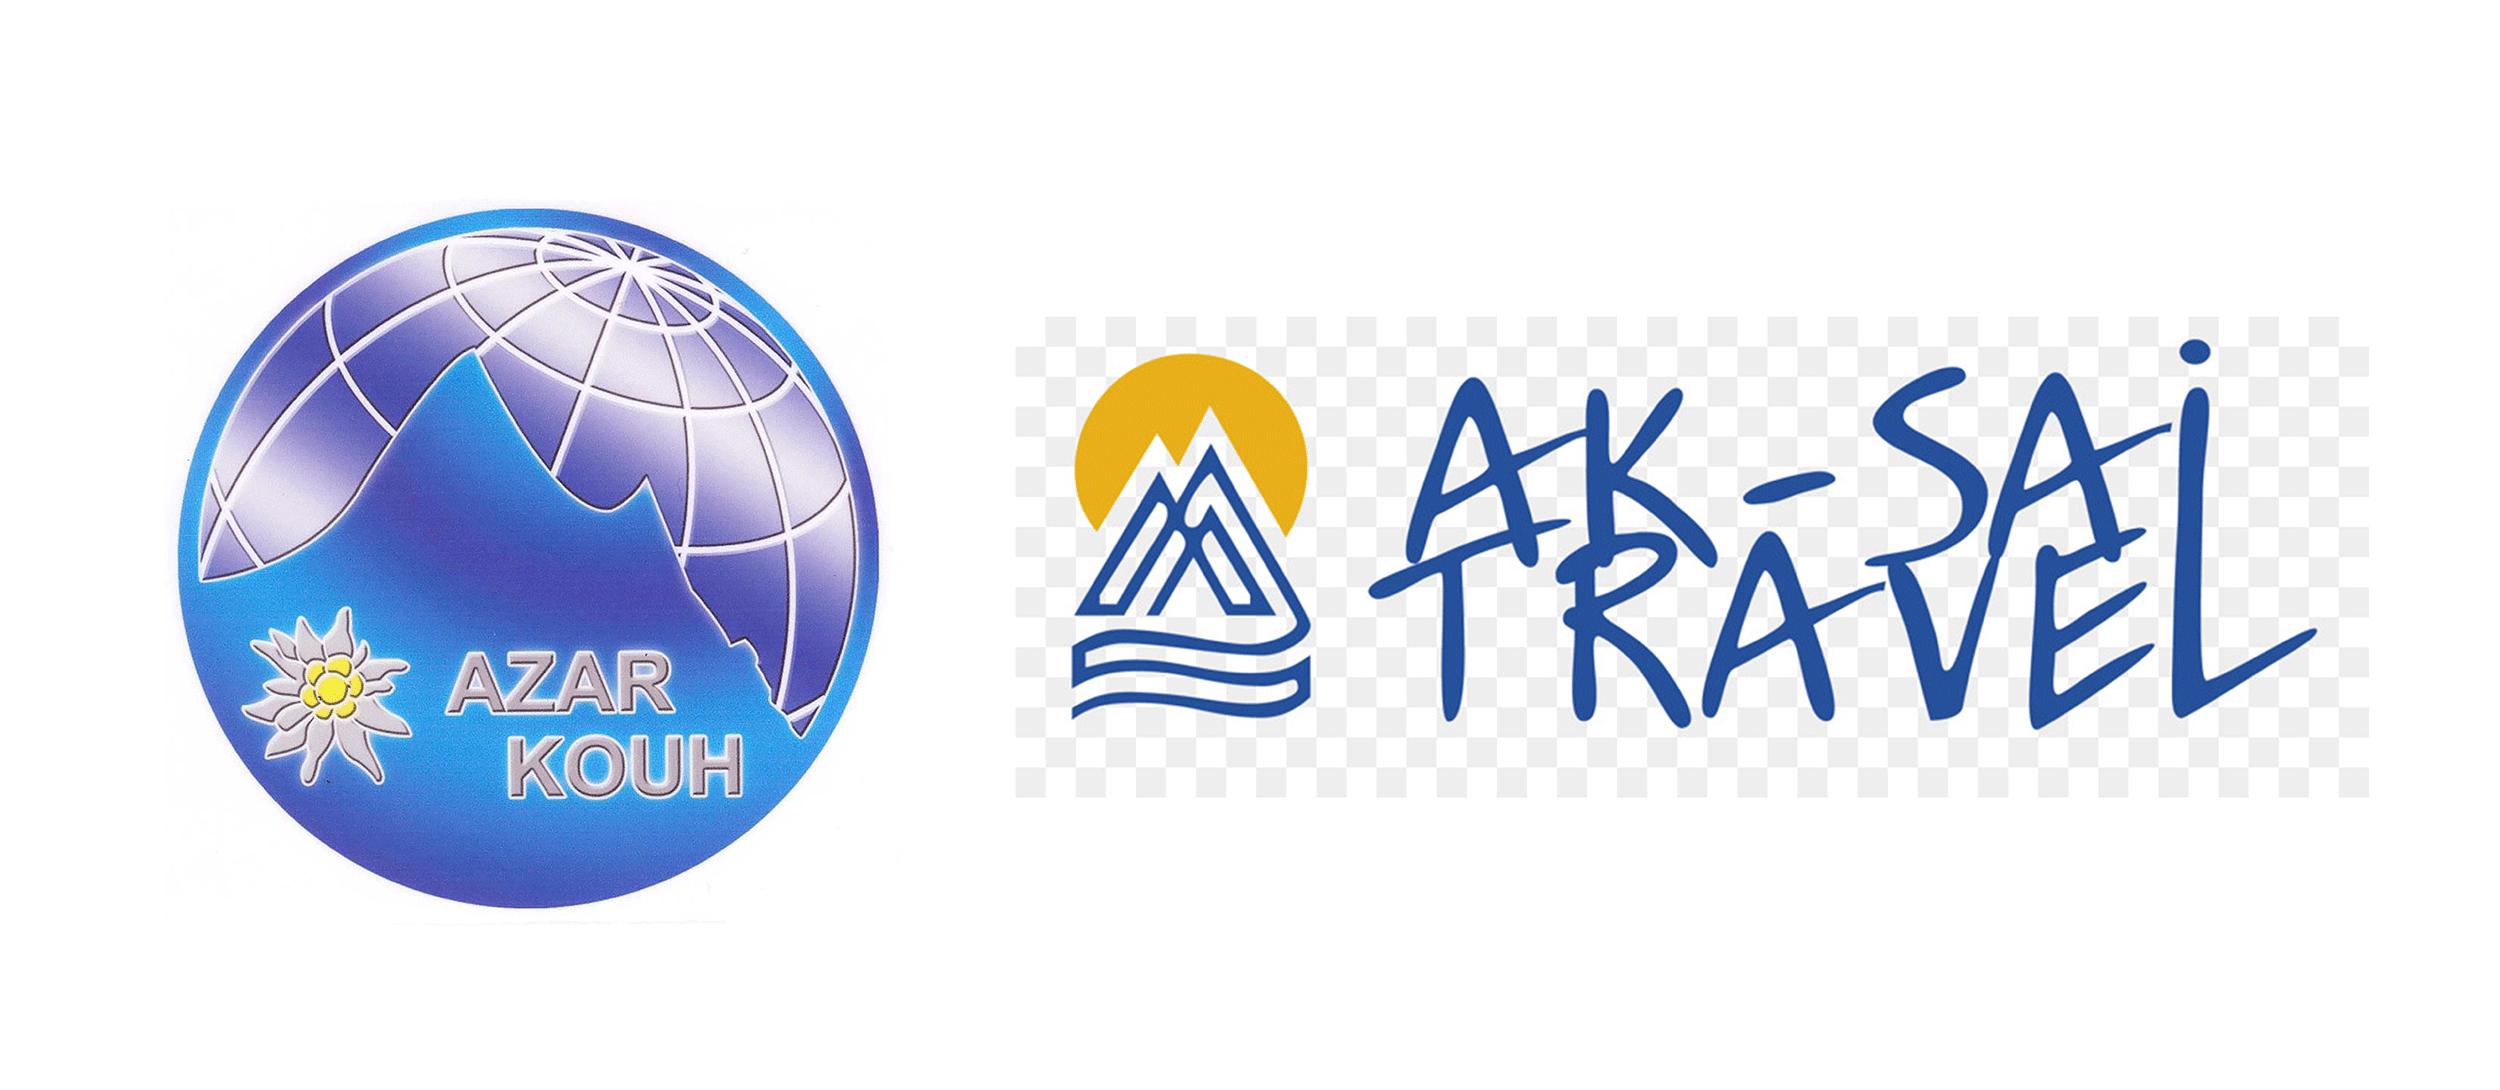 Azarkouh & Aksai travel